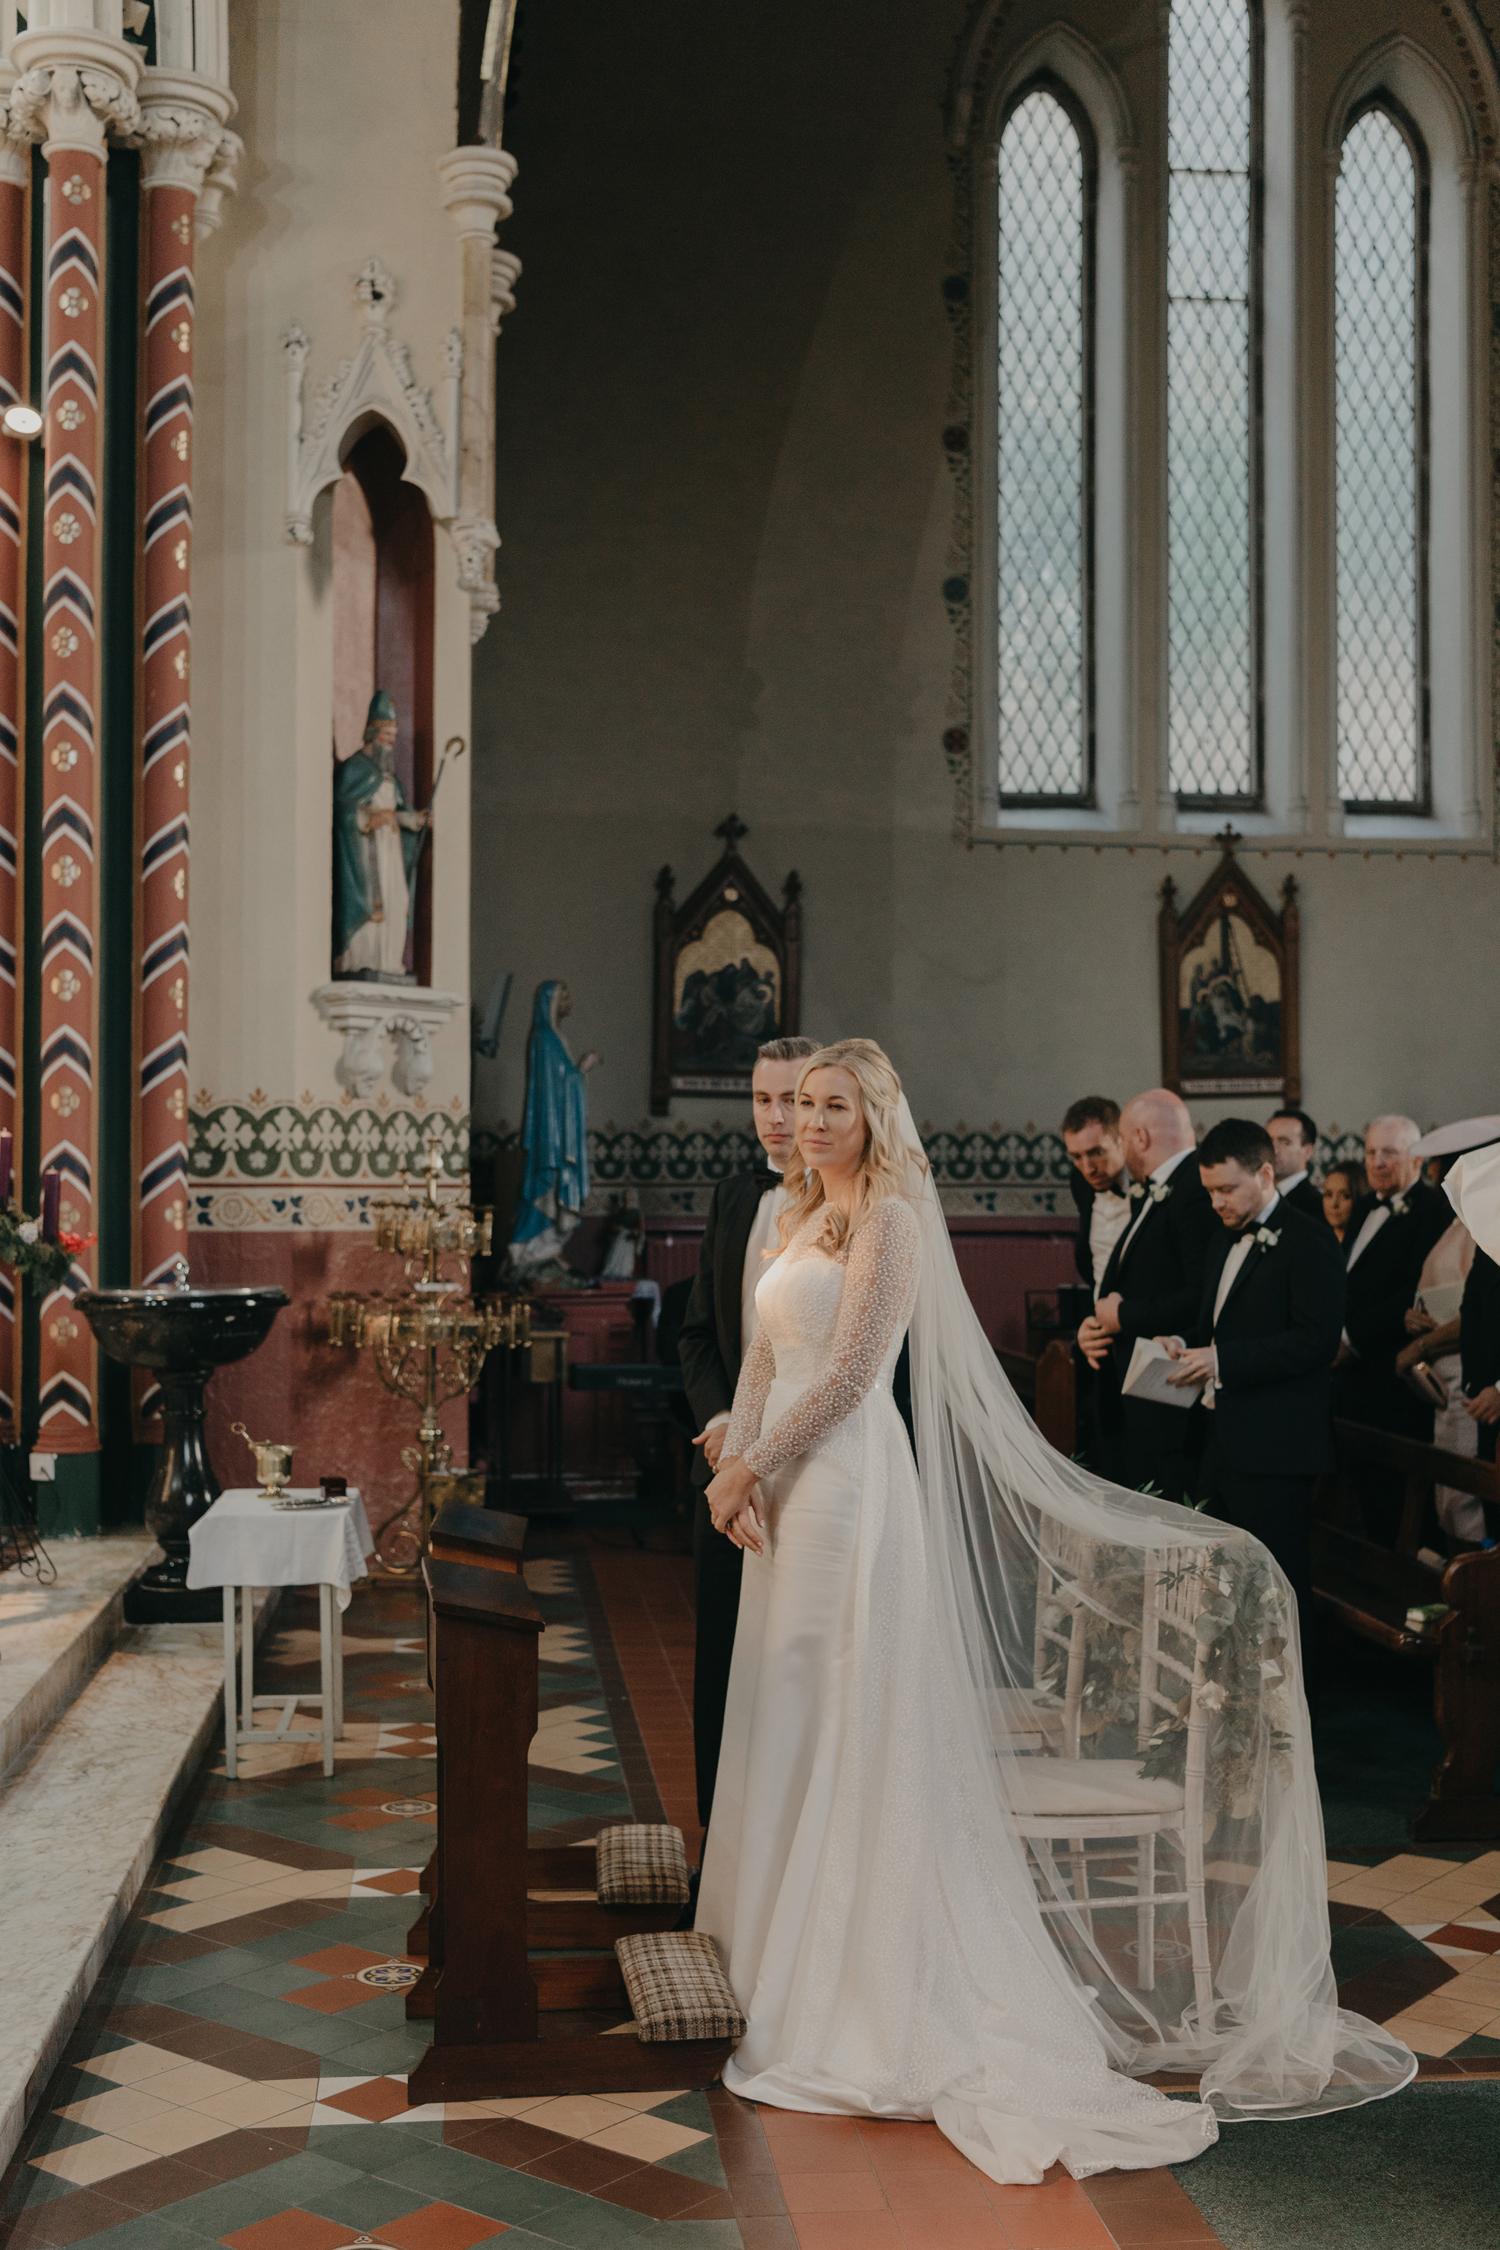 clonwilliam-house-wedding-photographer-099.jpg